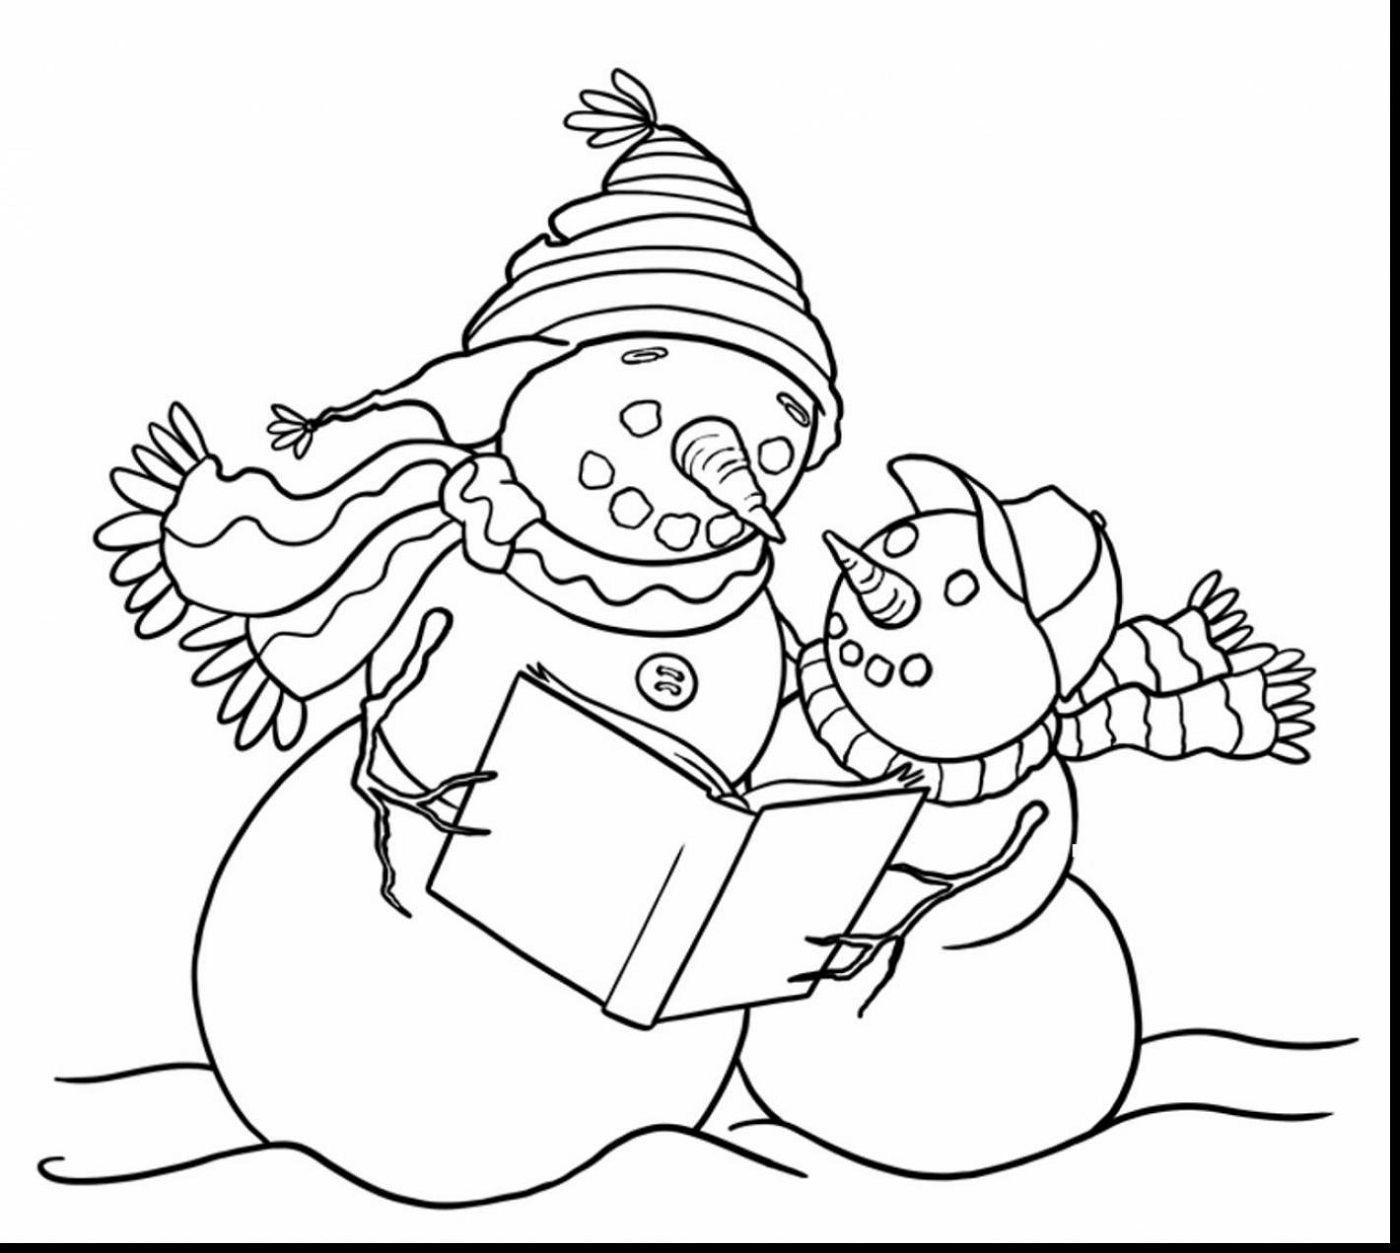 Dltk Crafts Snowman Coloring Printable K5 Worksheets Christmas Coloring Pages Printable Christmas Coloring Pages Family Coloring Pages